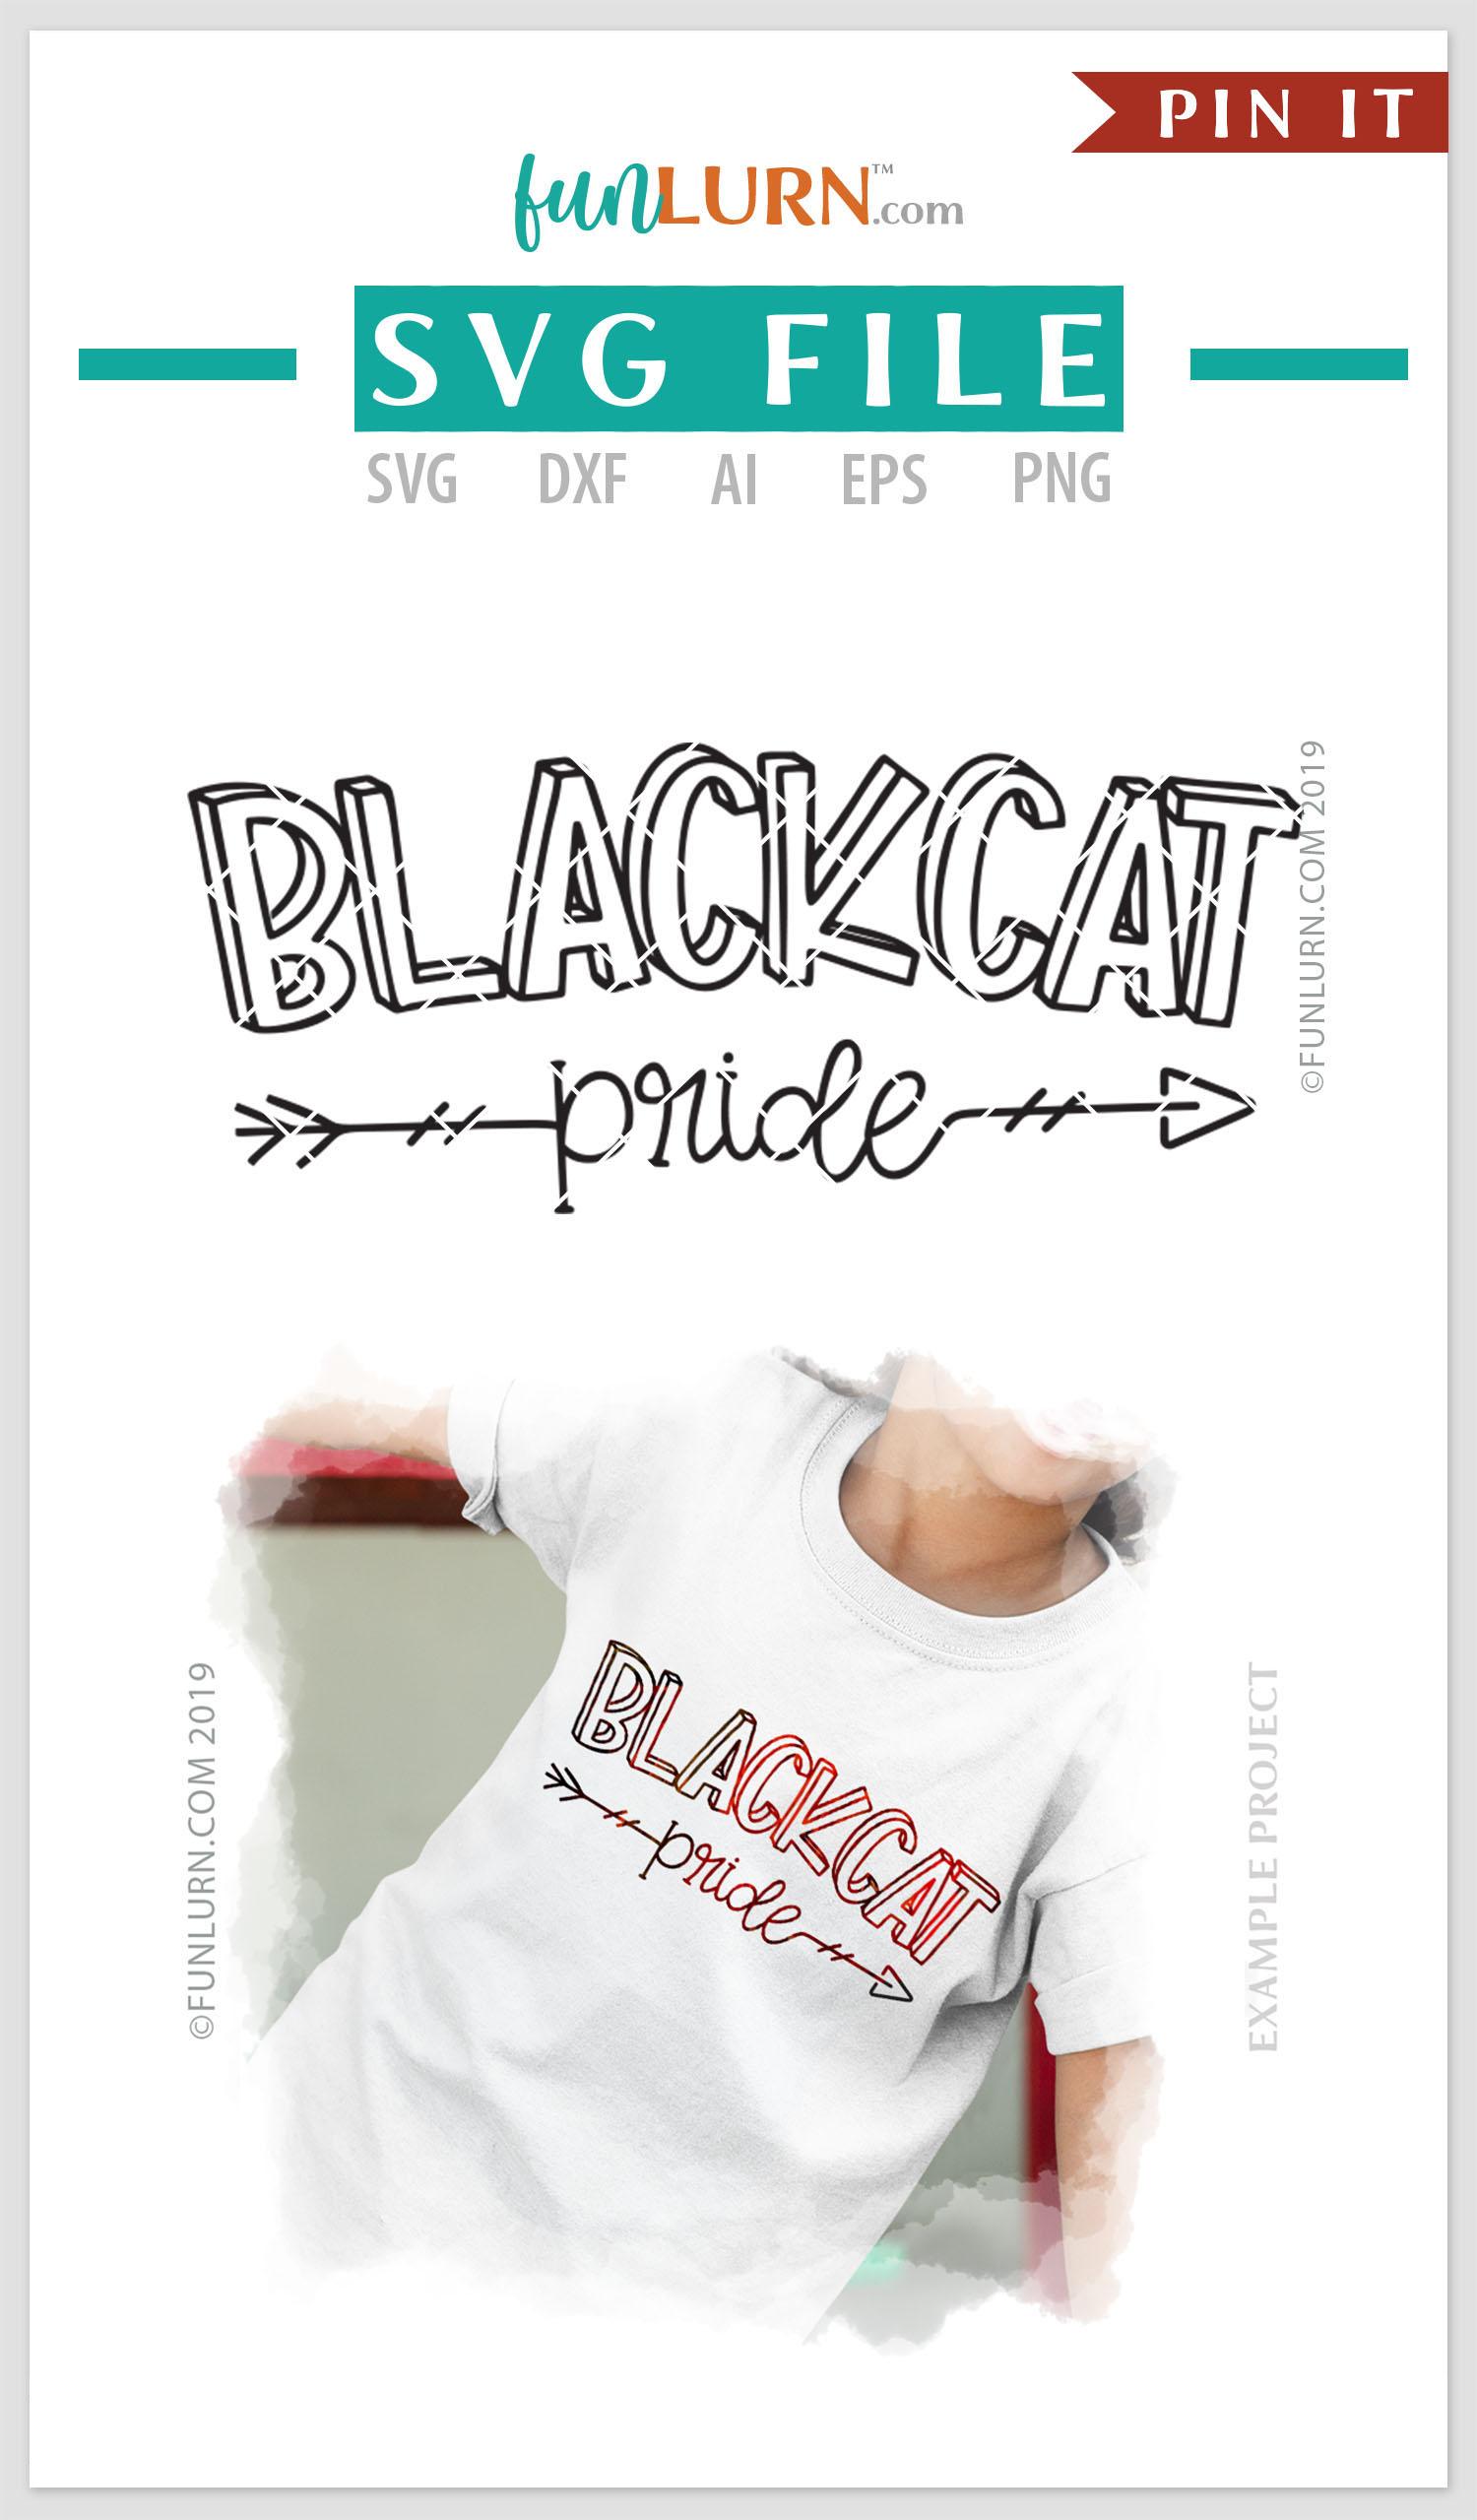 Blackcat Pride Team SVG Cut File example image 4